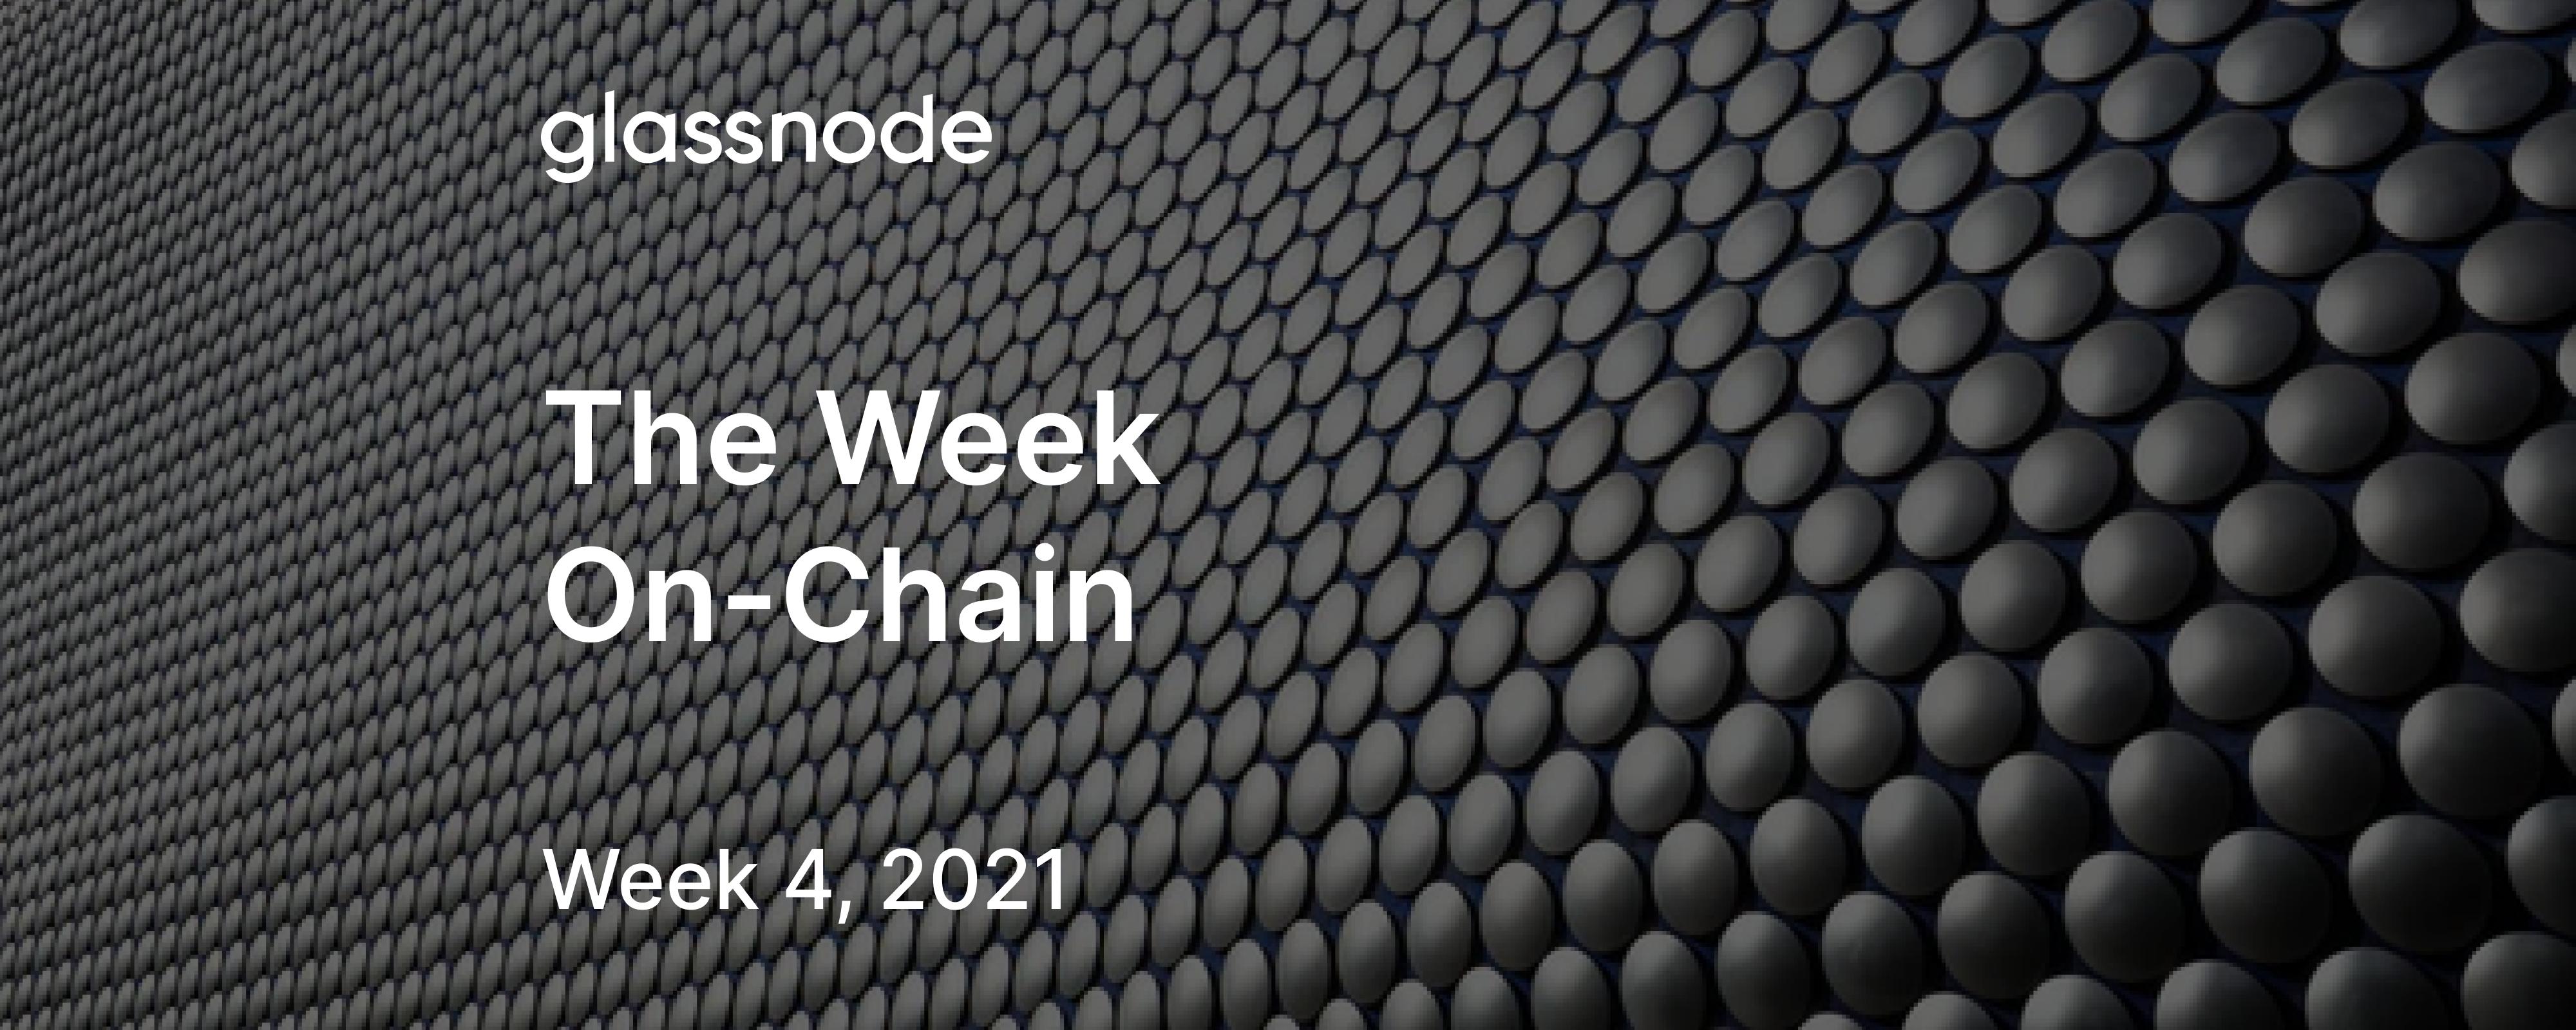 The Week On-Chain (Week 4, 2021)